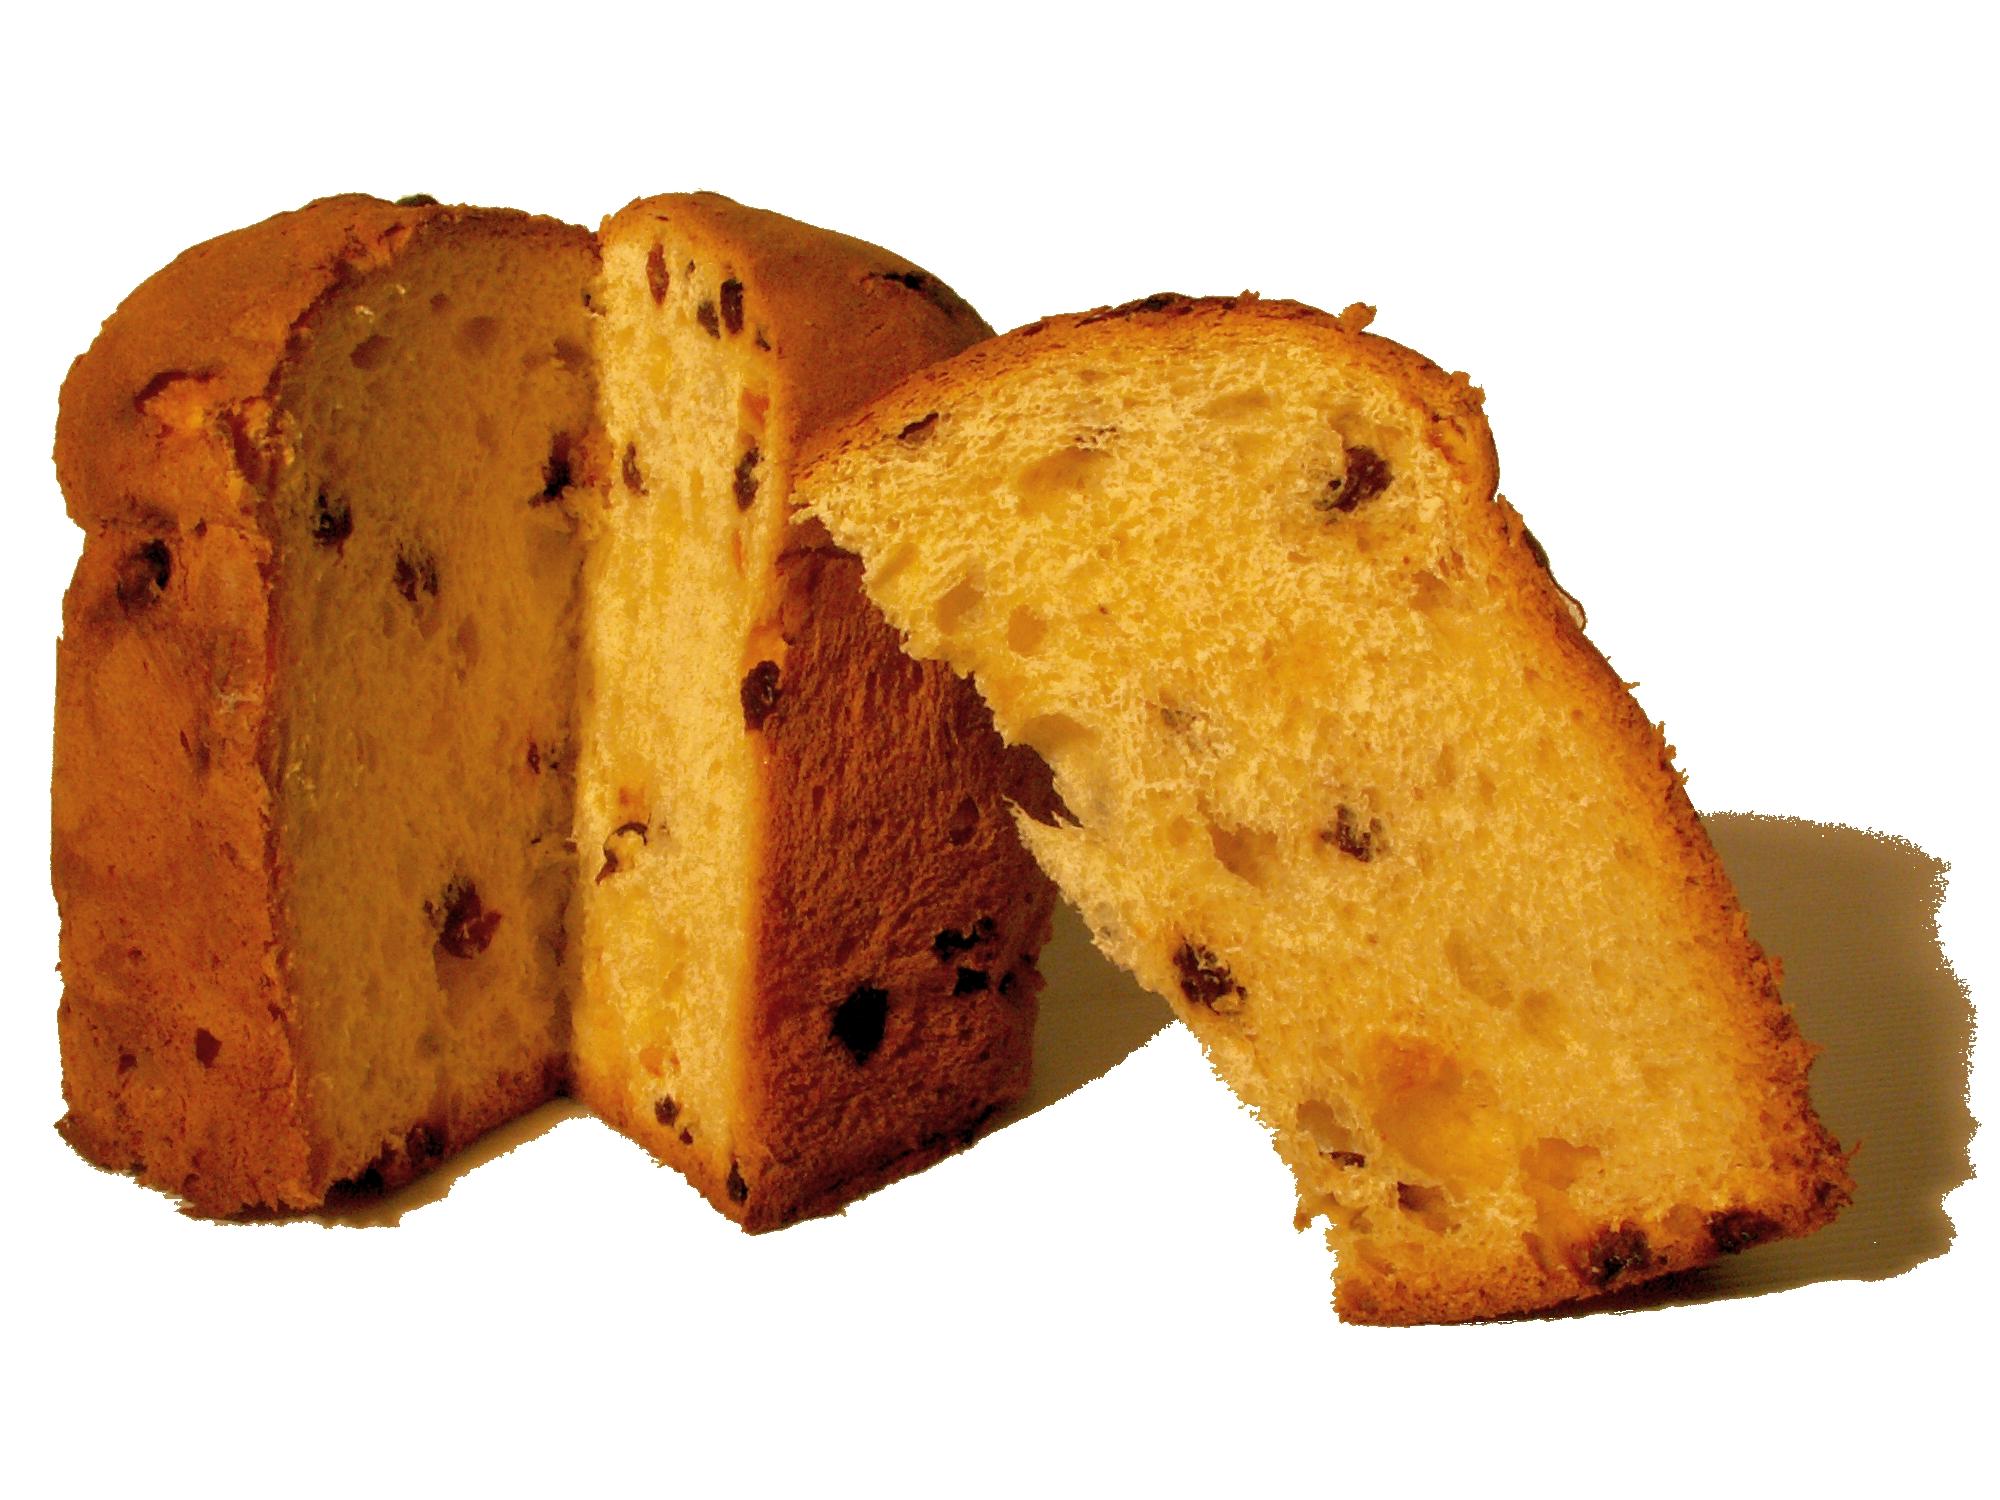 File:Panettone aufgeschnitten freigestellt.jpg - Wikipedia